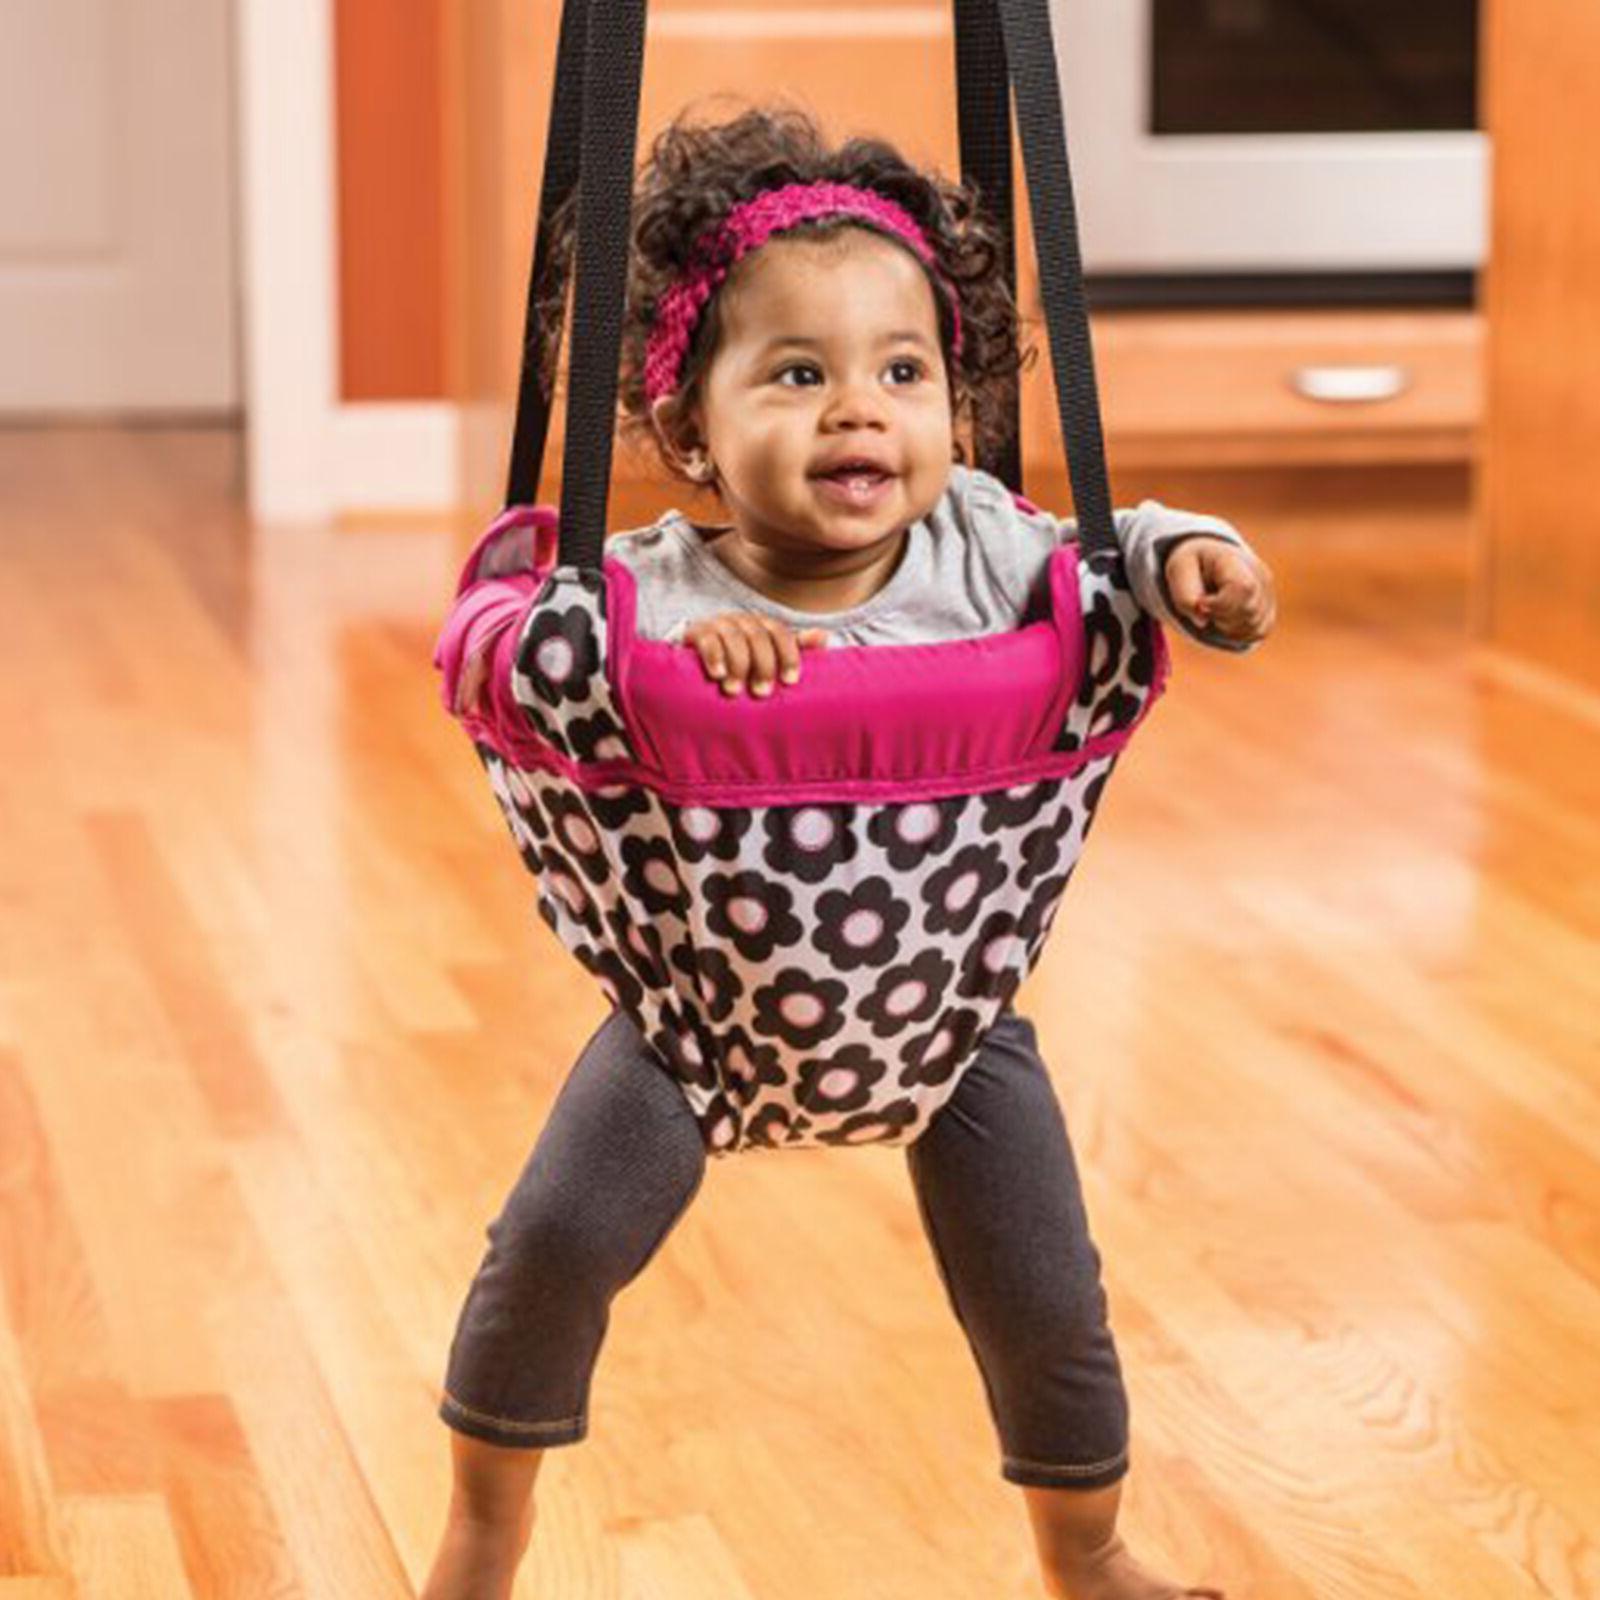 Baby ExerSaucer Exerciser Jump